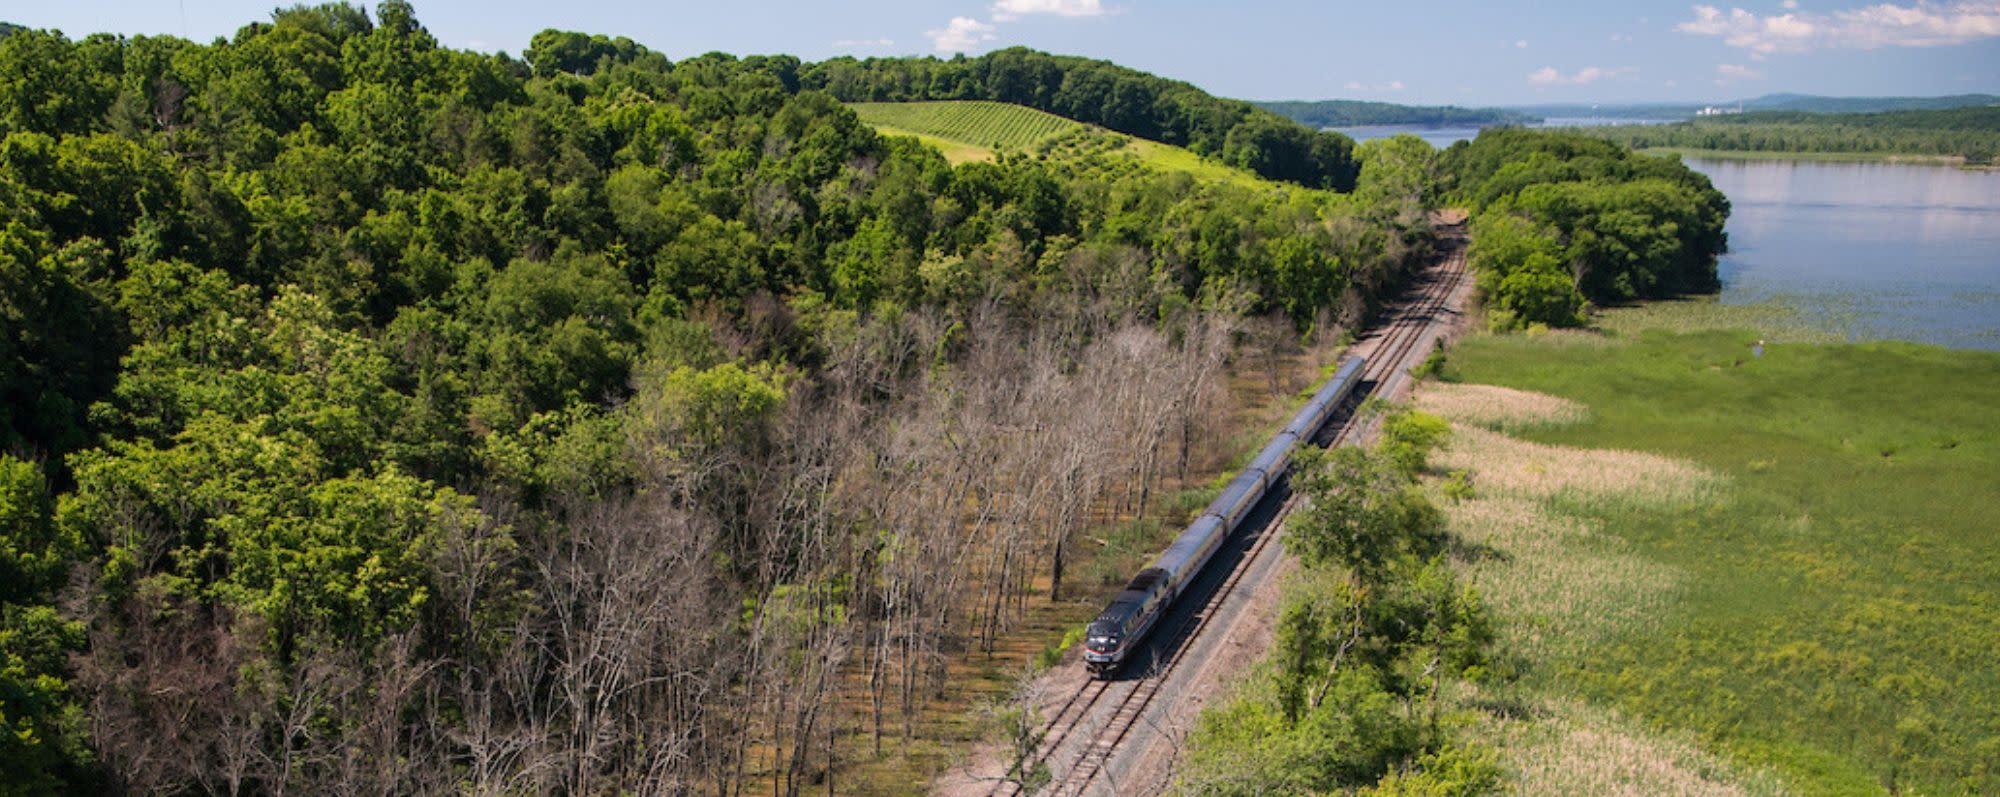 Amtrak Train in Hudson Valley